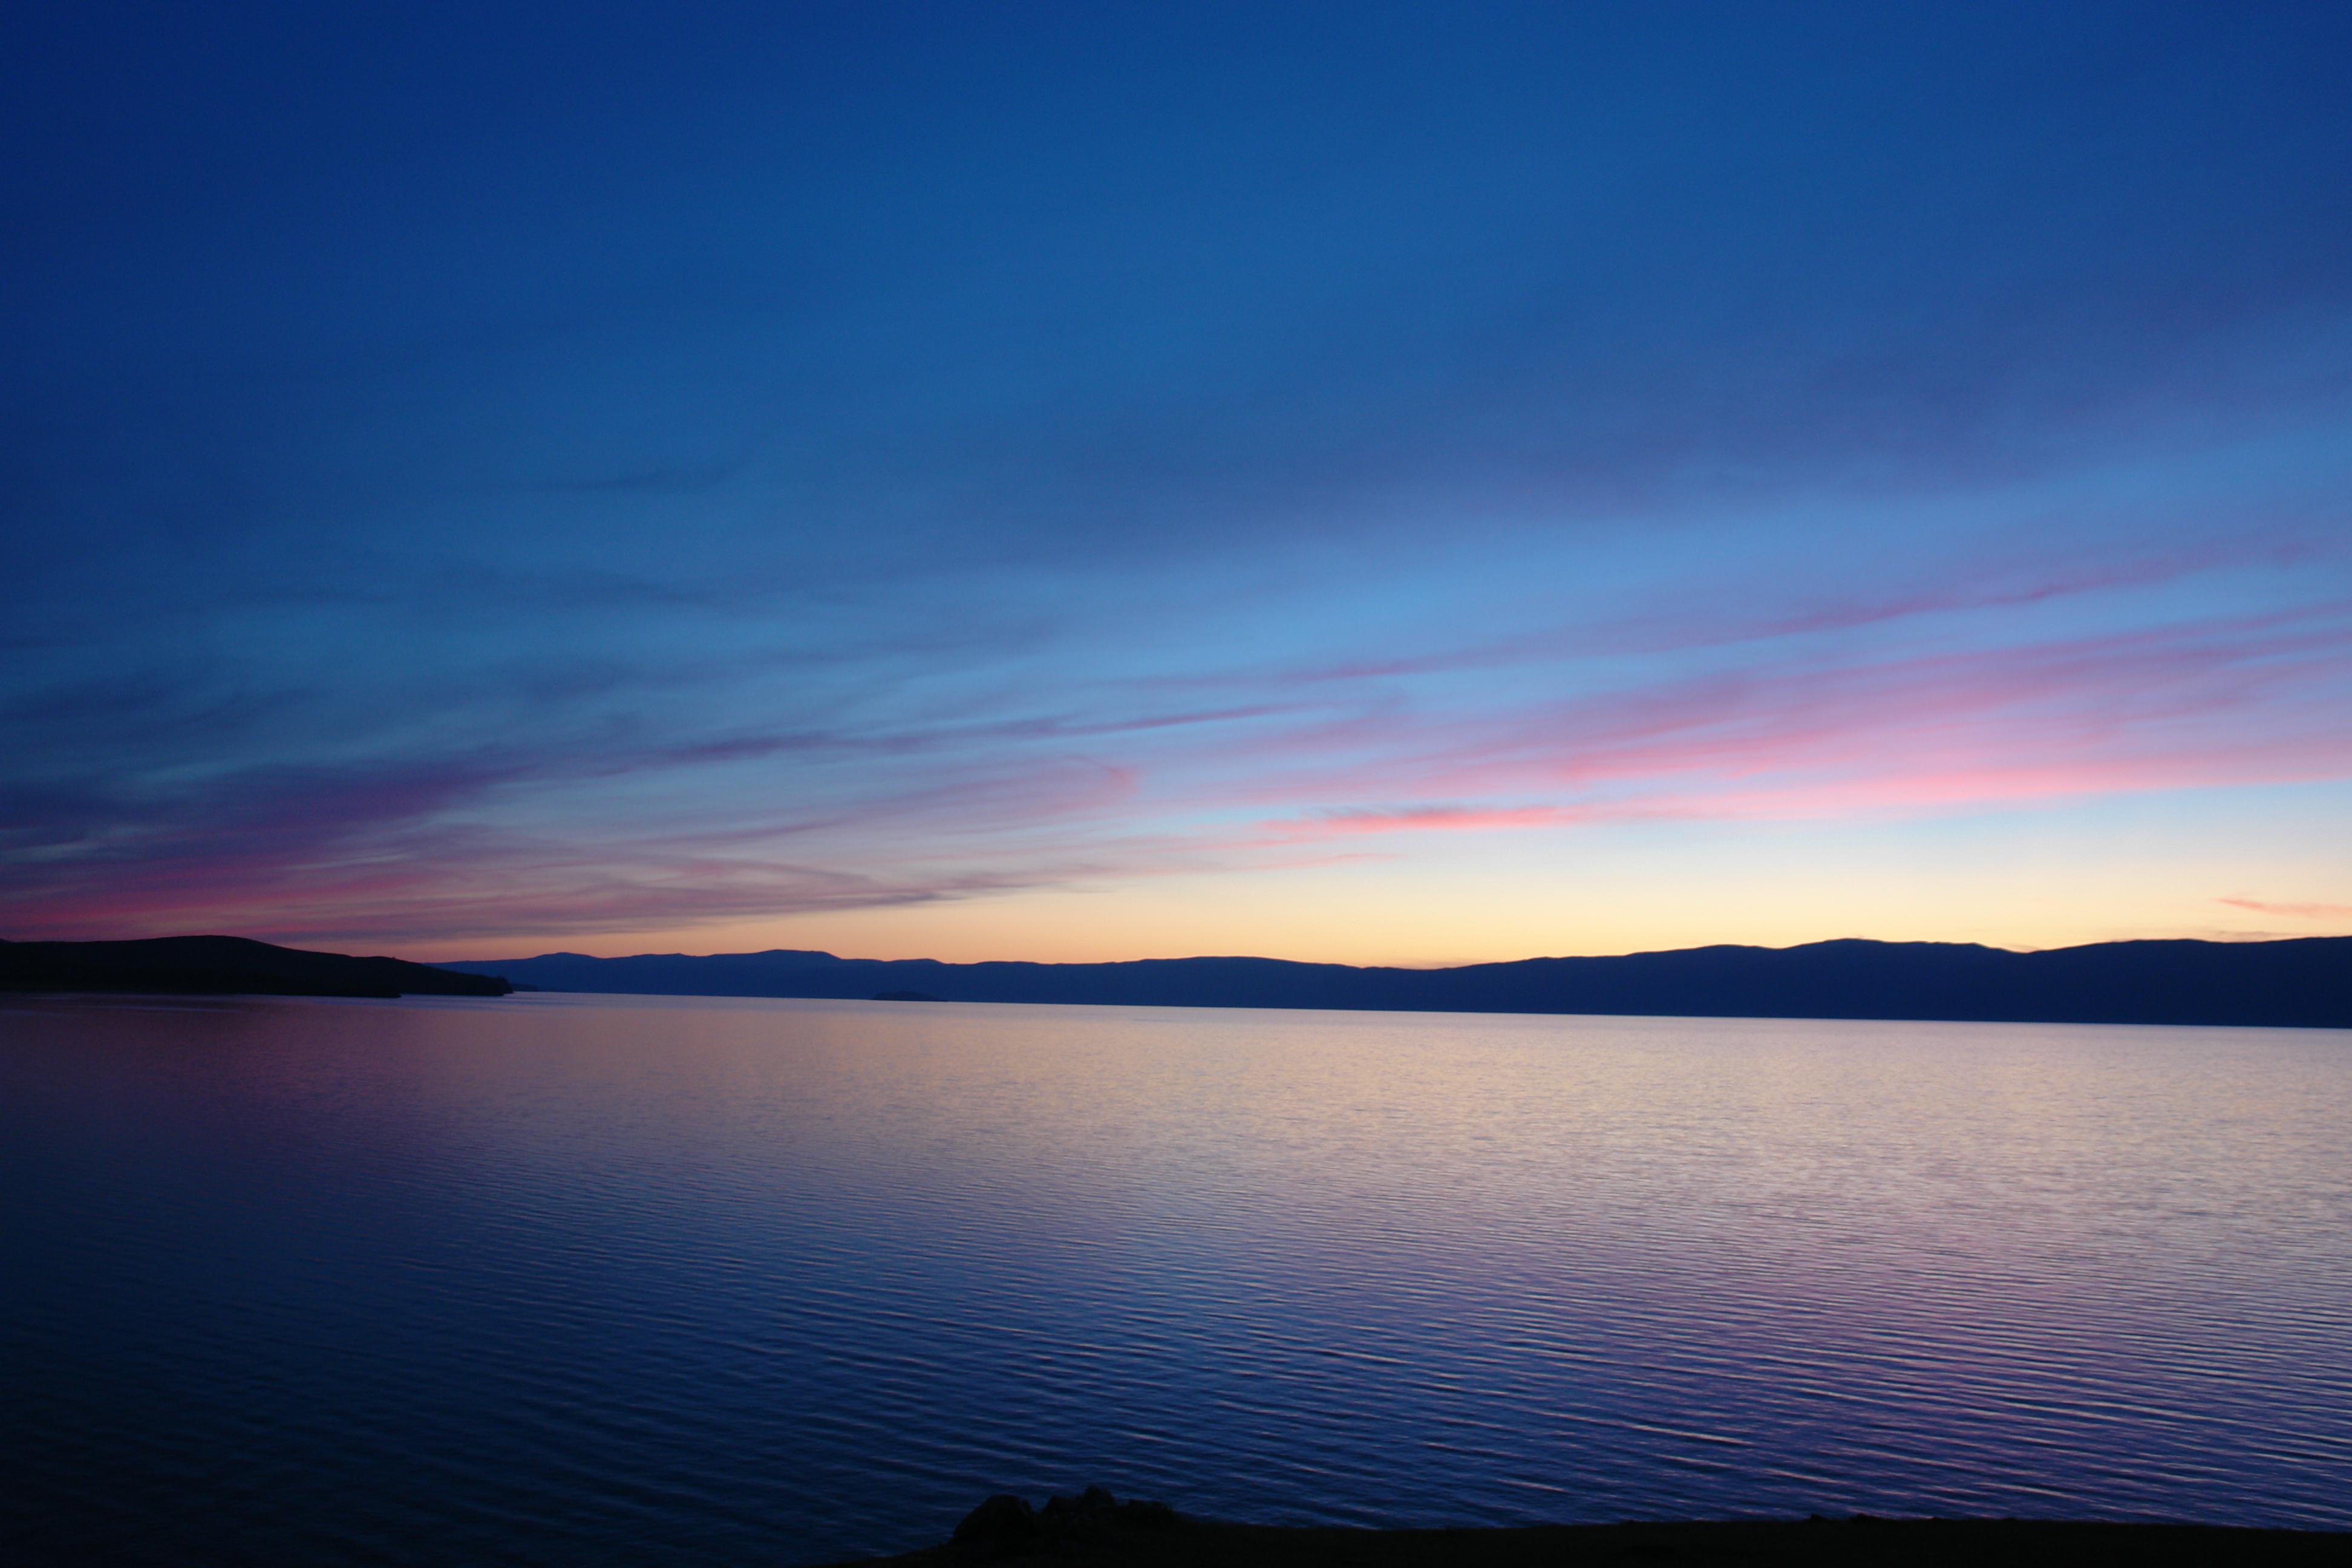 wallpaper hd sea sunset